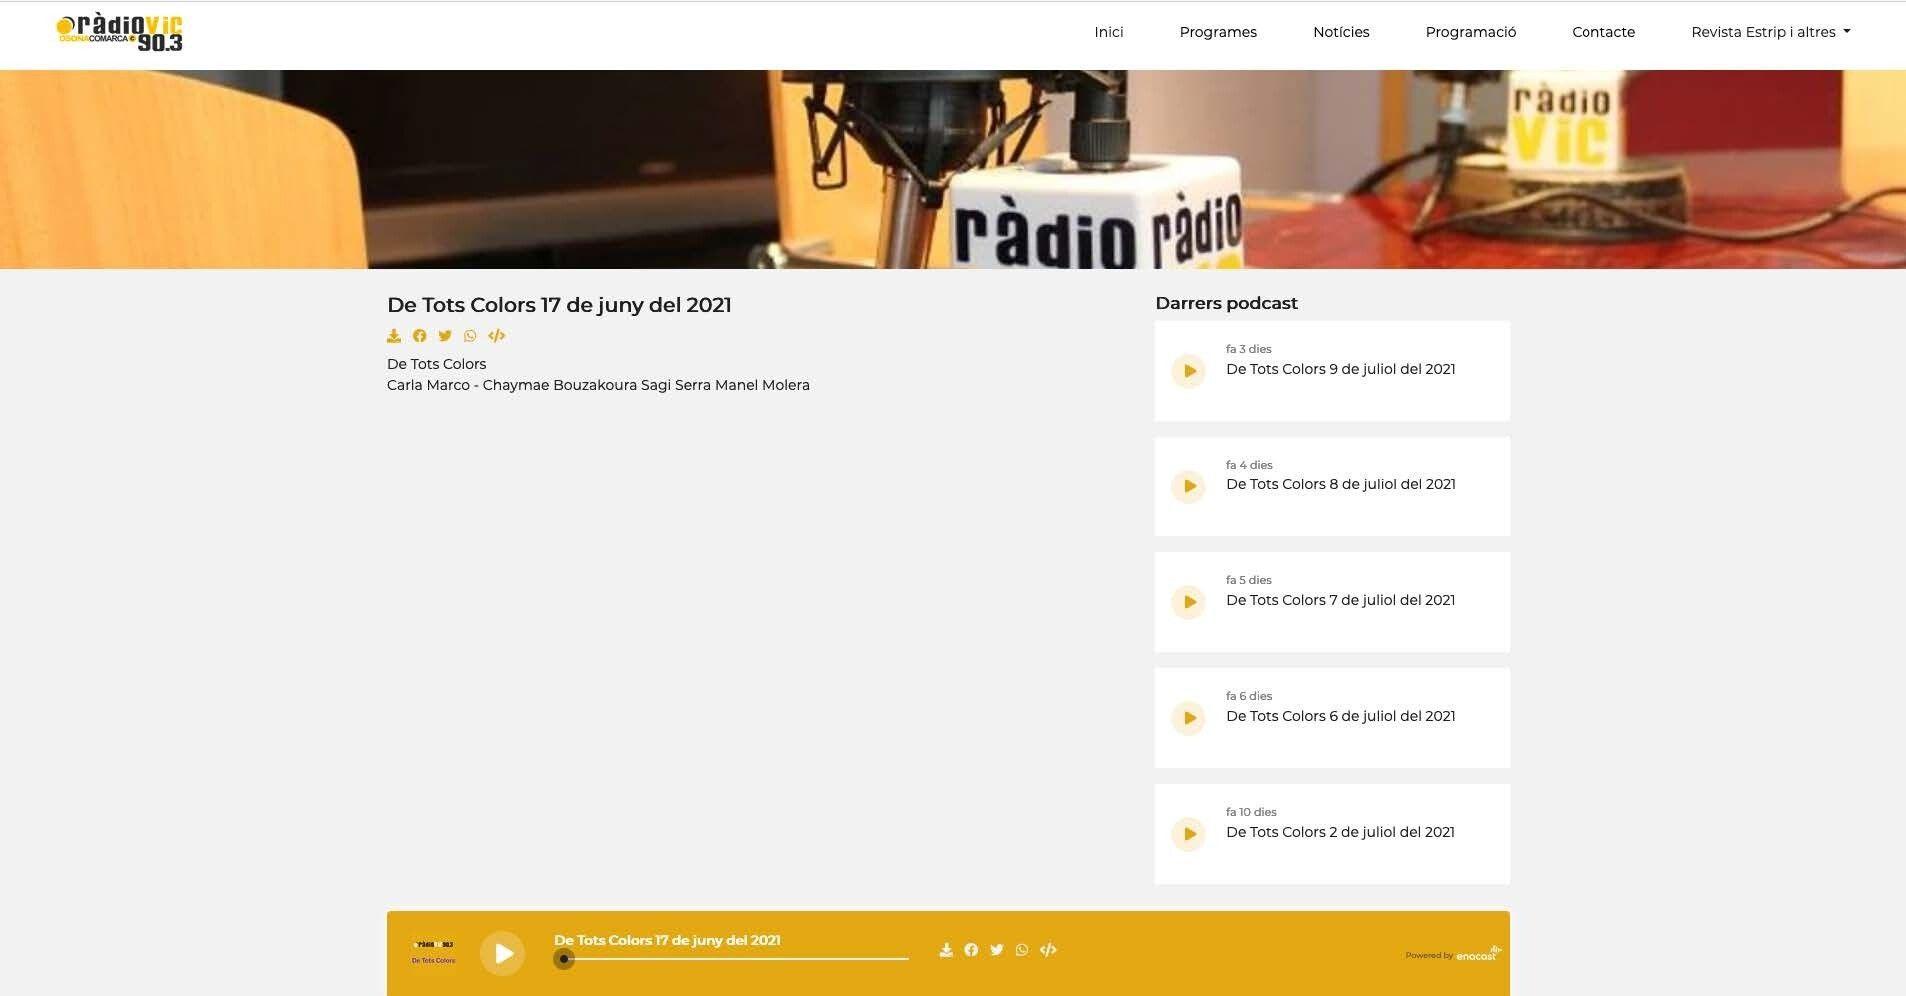 17.06.2021 radiovic